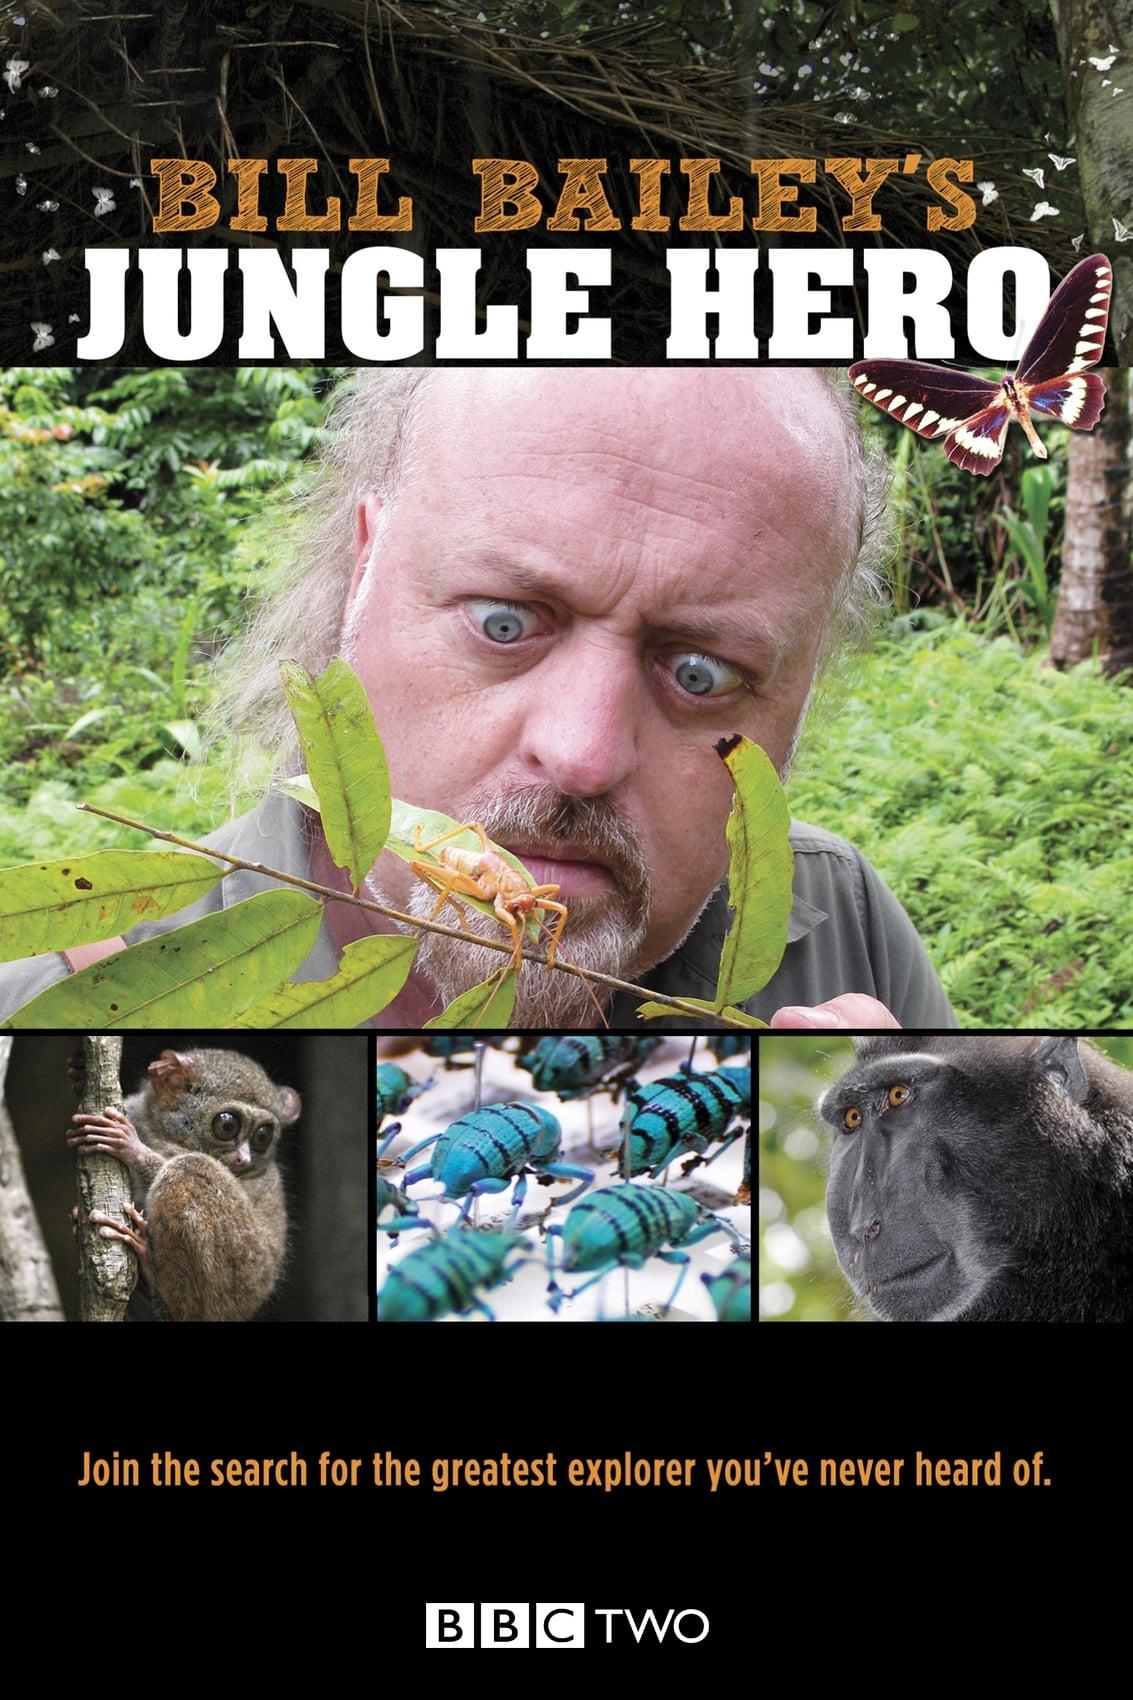 Bill Bailey's Jungle Hero TV Shows About Jungle